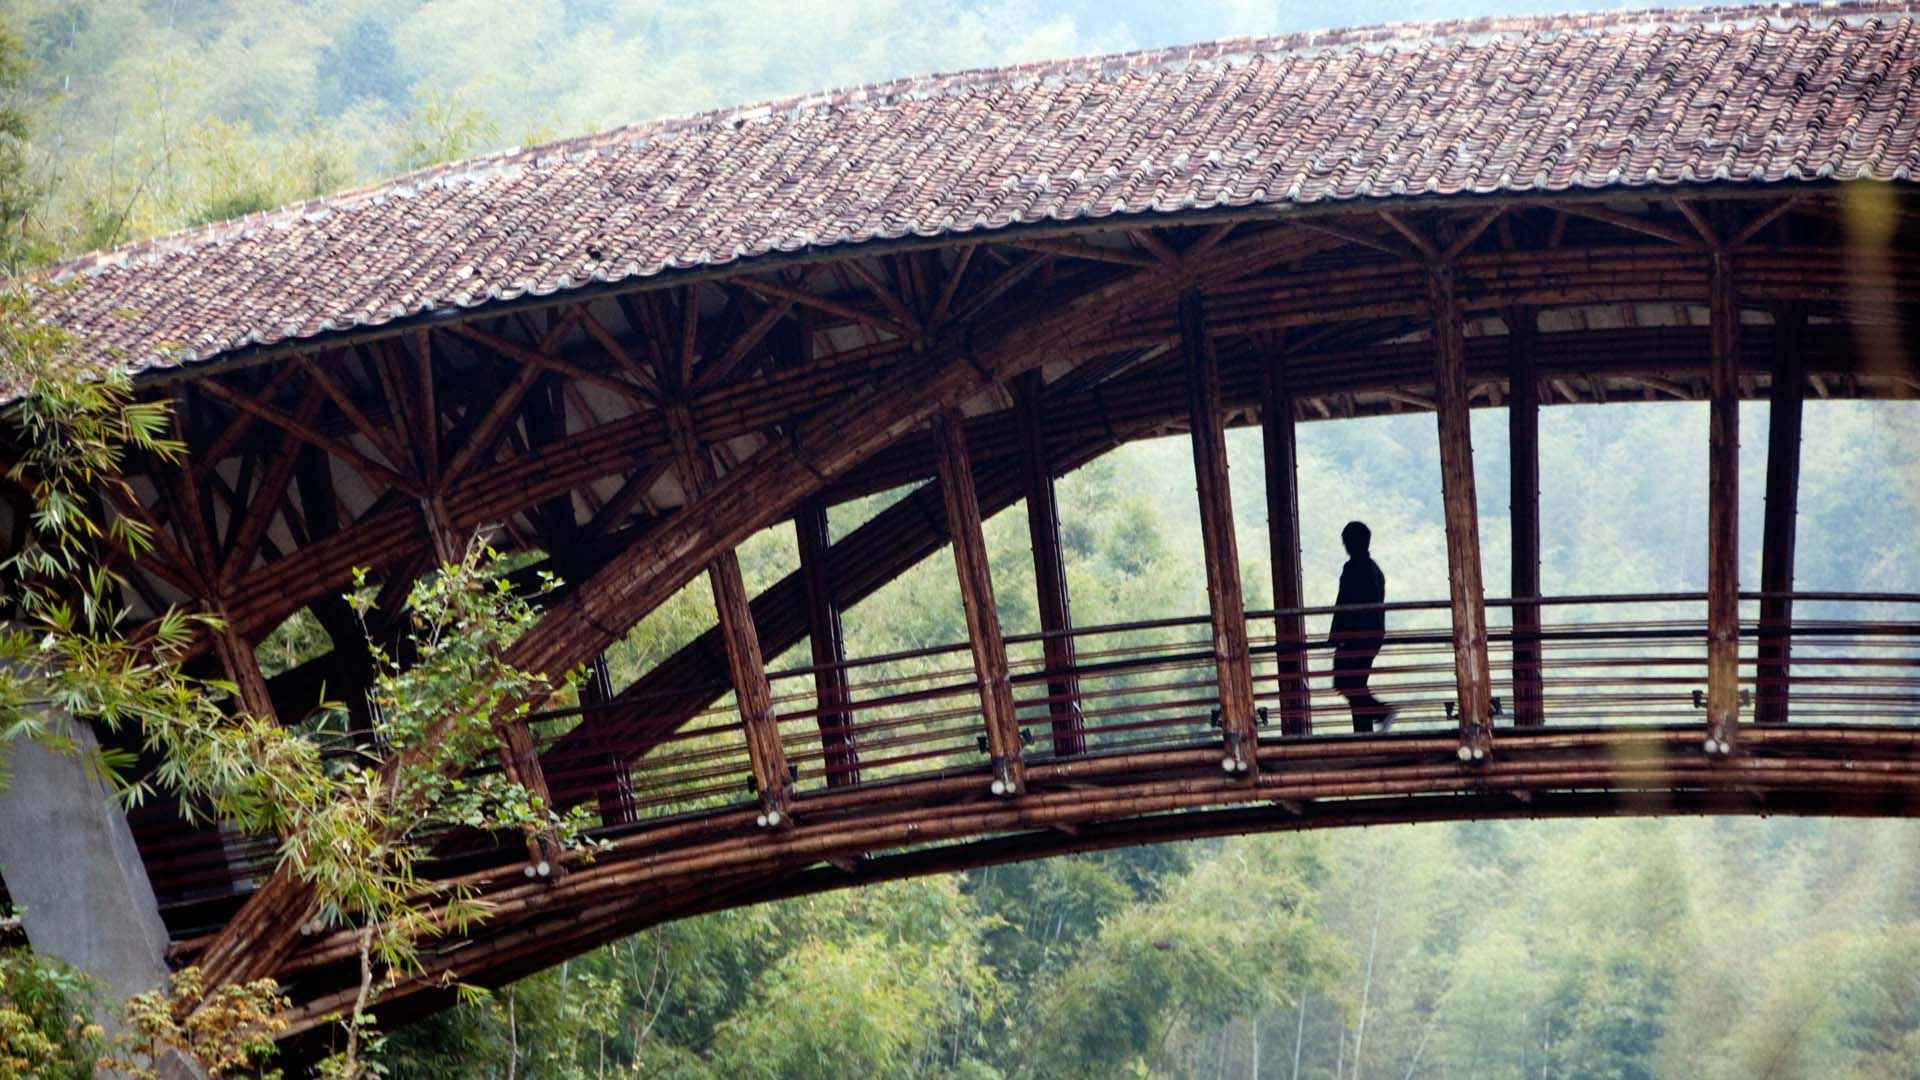 Crosswaters Ecolodge Bridge Bamboo Person 239 Jpg 1920 1080